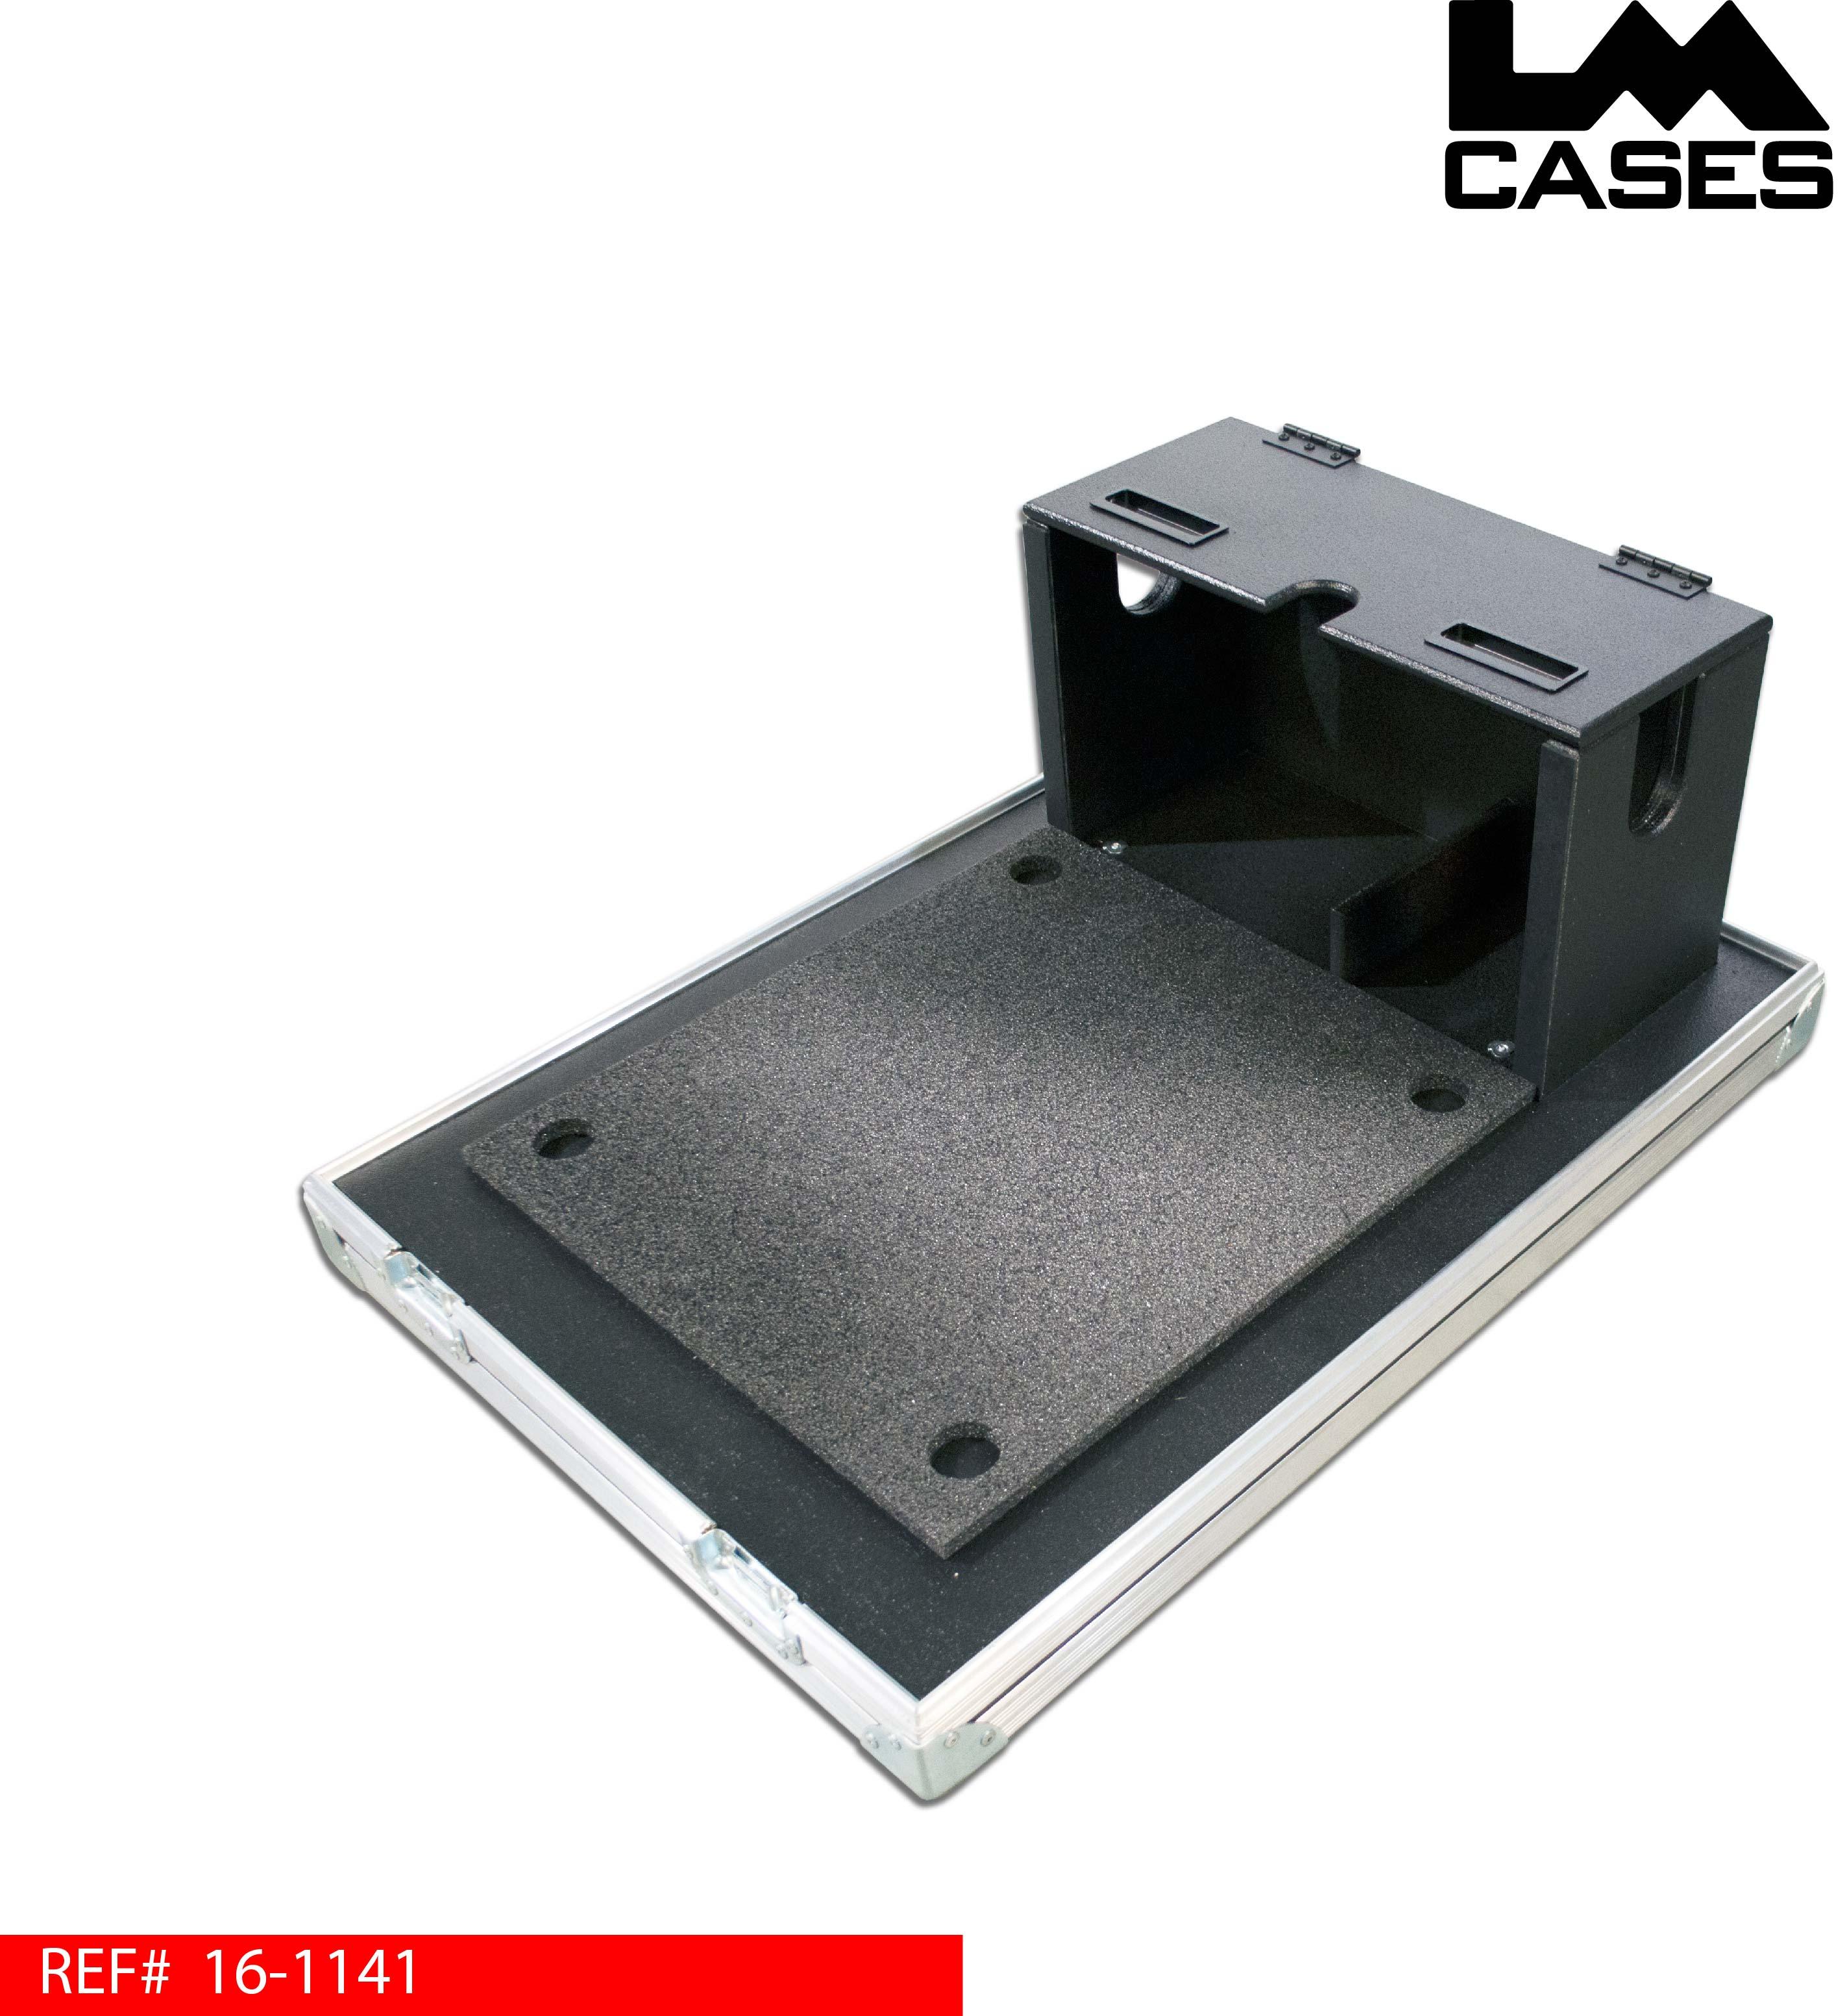 yamaha ql1. yamaha ql1 mixing console case with doghouse ql1